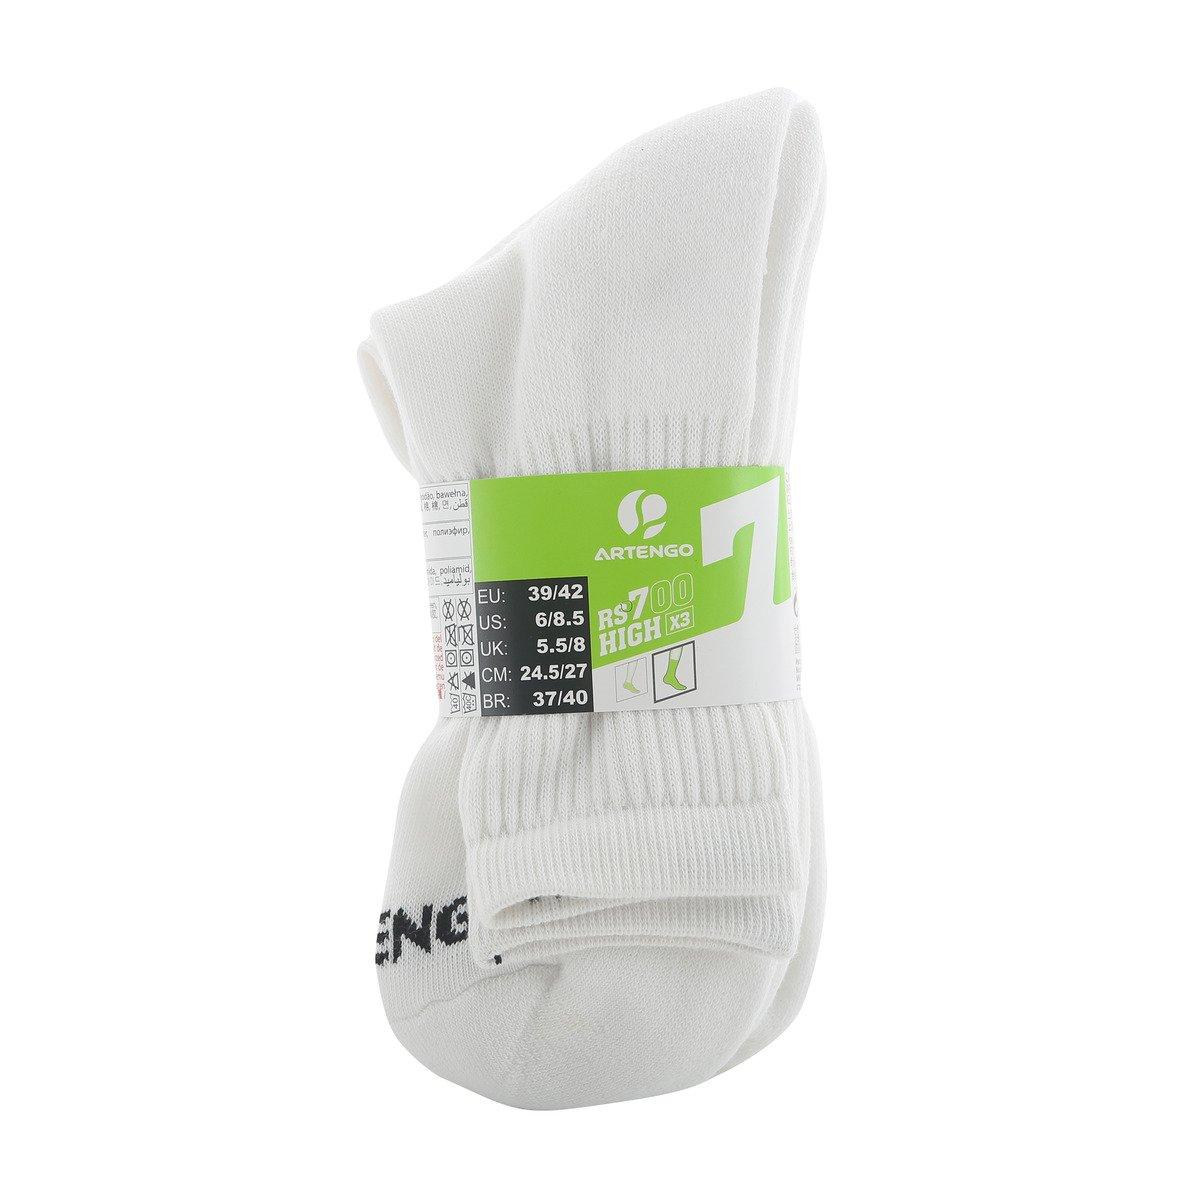 X de Sports Artengo Unisex Comfort Tenis Bádminton Calcetines de 3 Pack White - Calcetines para hombre, Weiß Lang: Amazon.es: Deportes y aire libre